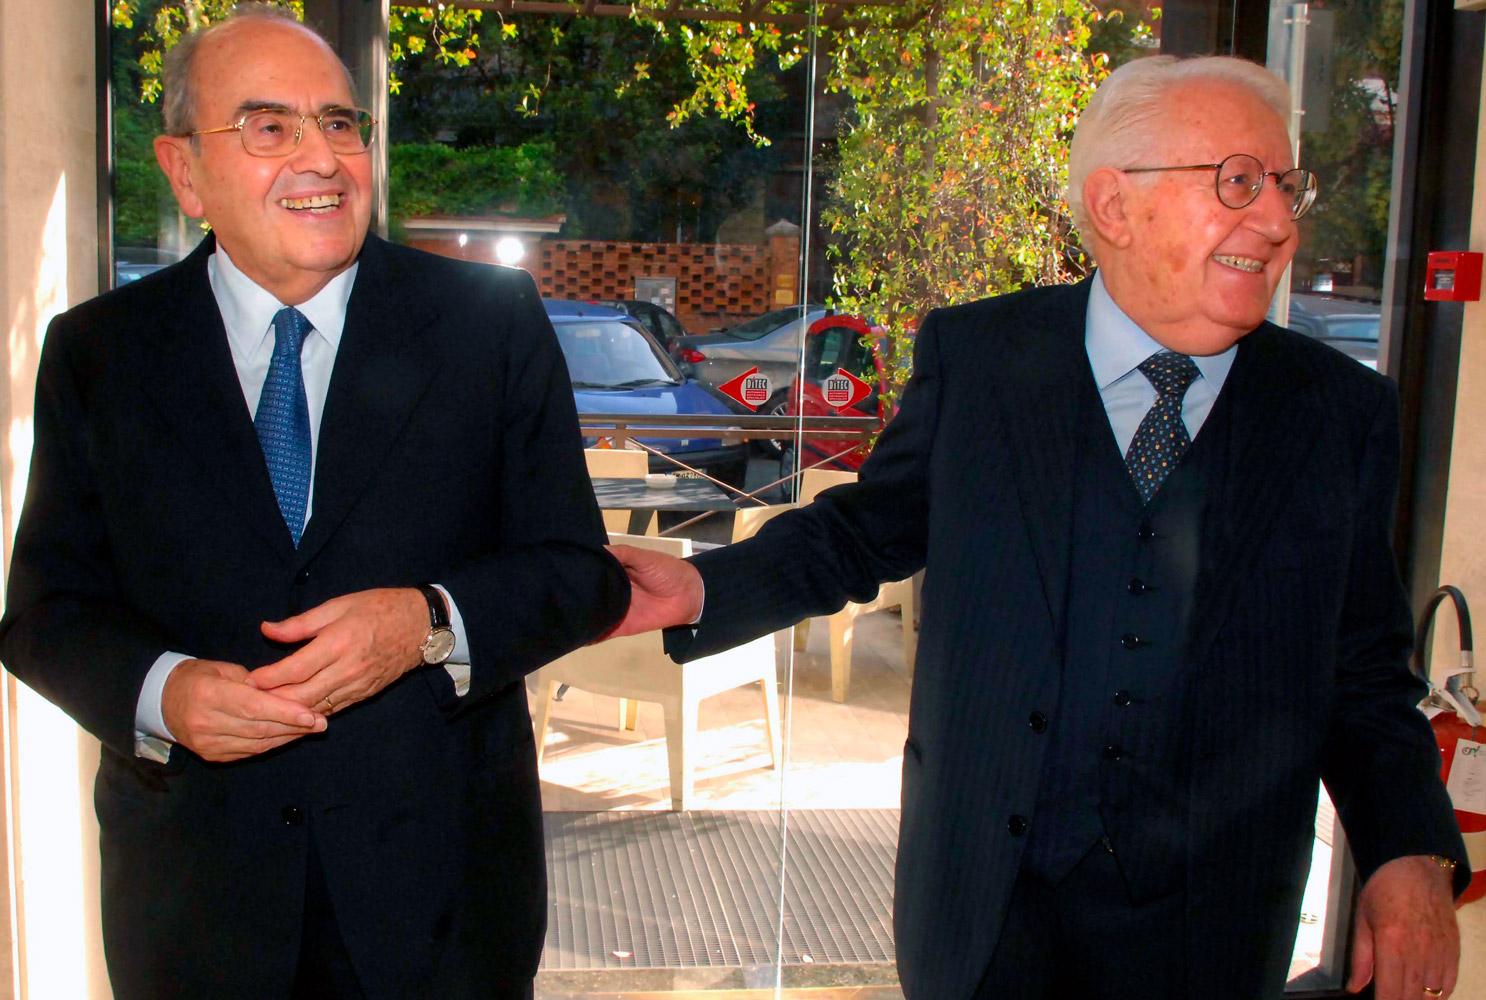 Giuseppe Zamberletti e Francesco Merloni (fonte: Imagoeconomica)